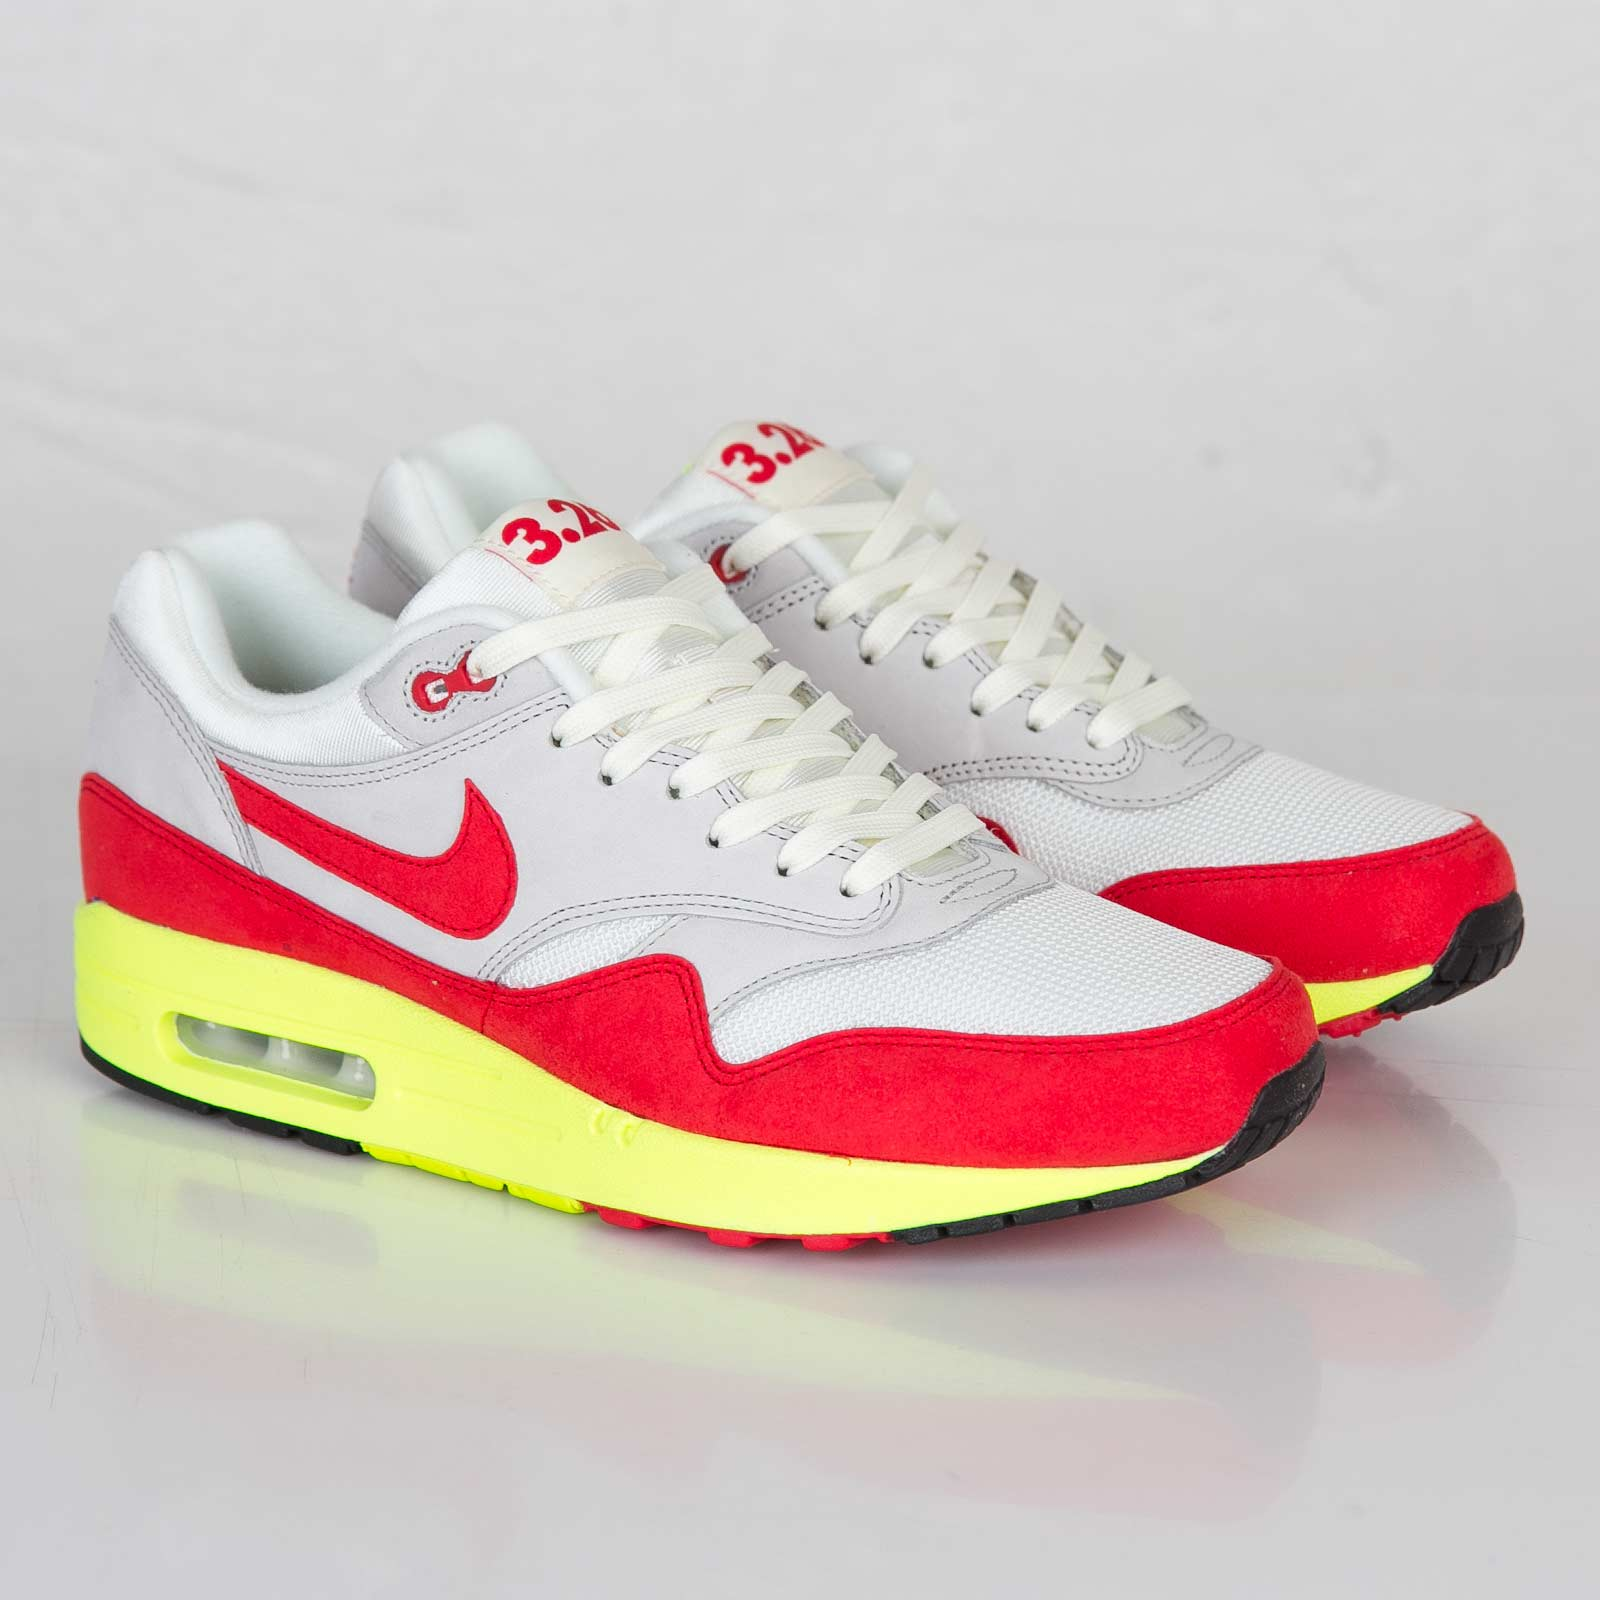 af35ddff6777 Nike Air Max 1 Premium QS - 665873-106 - Sneakersnstuff